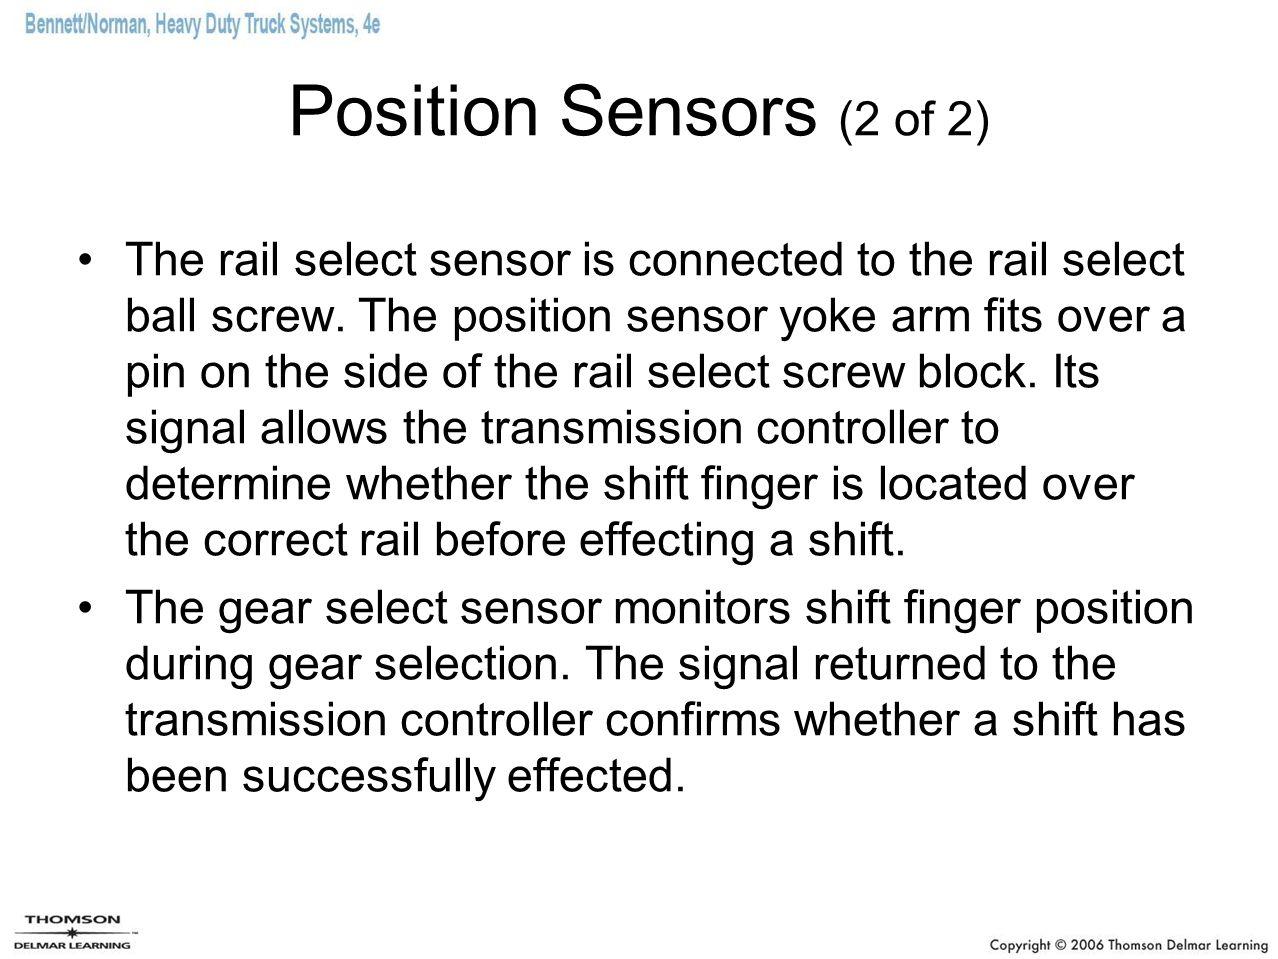 Position Sensors (2 of 2)